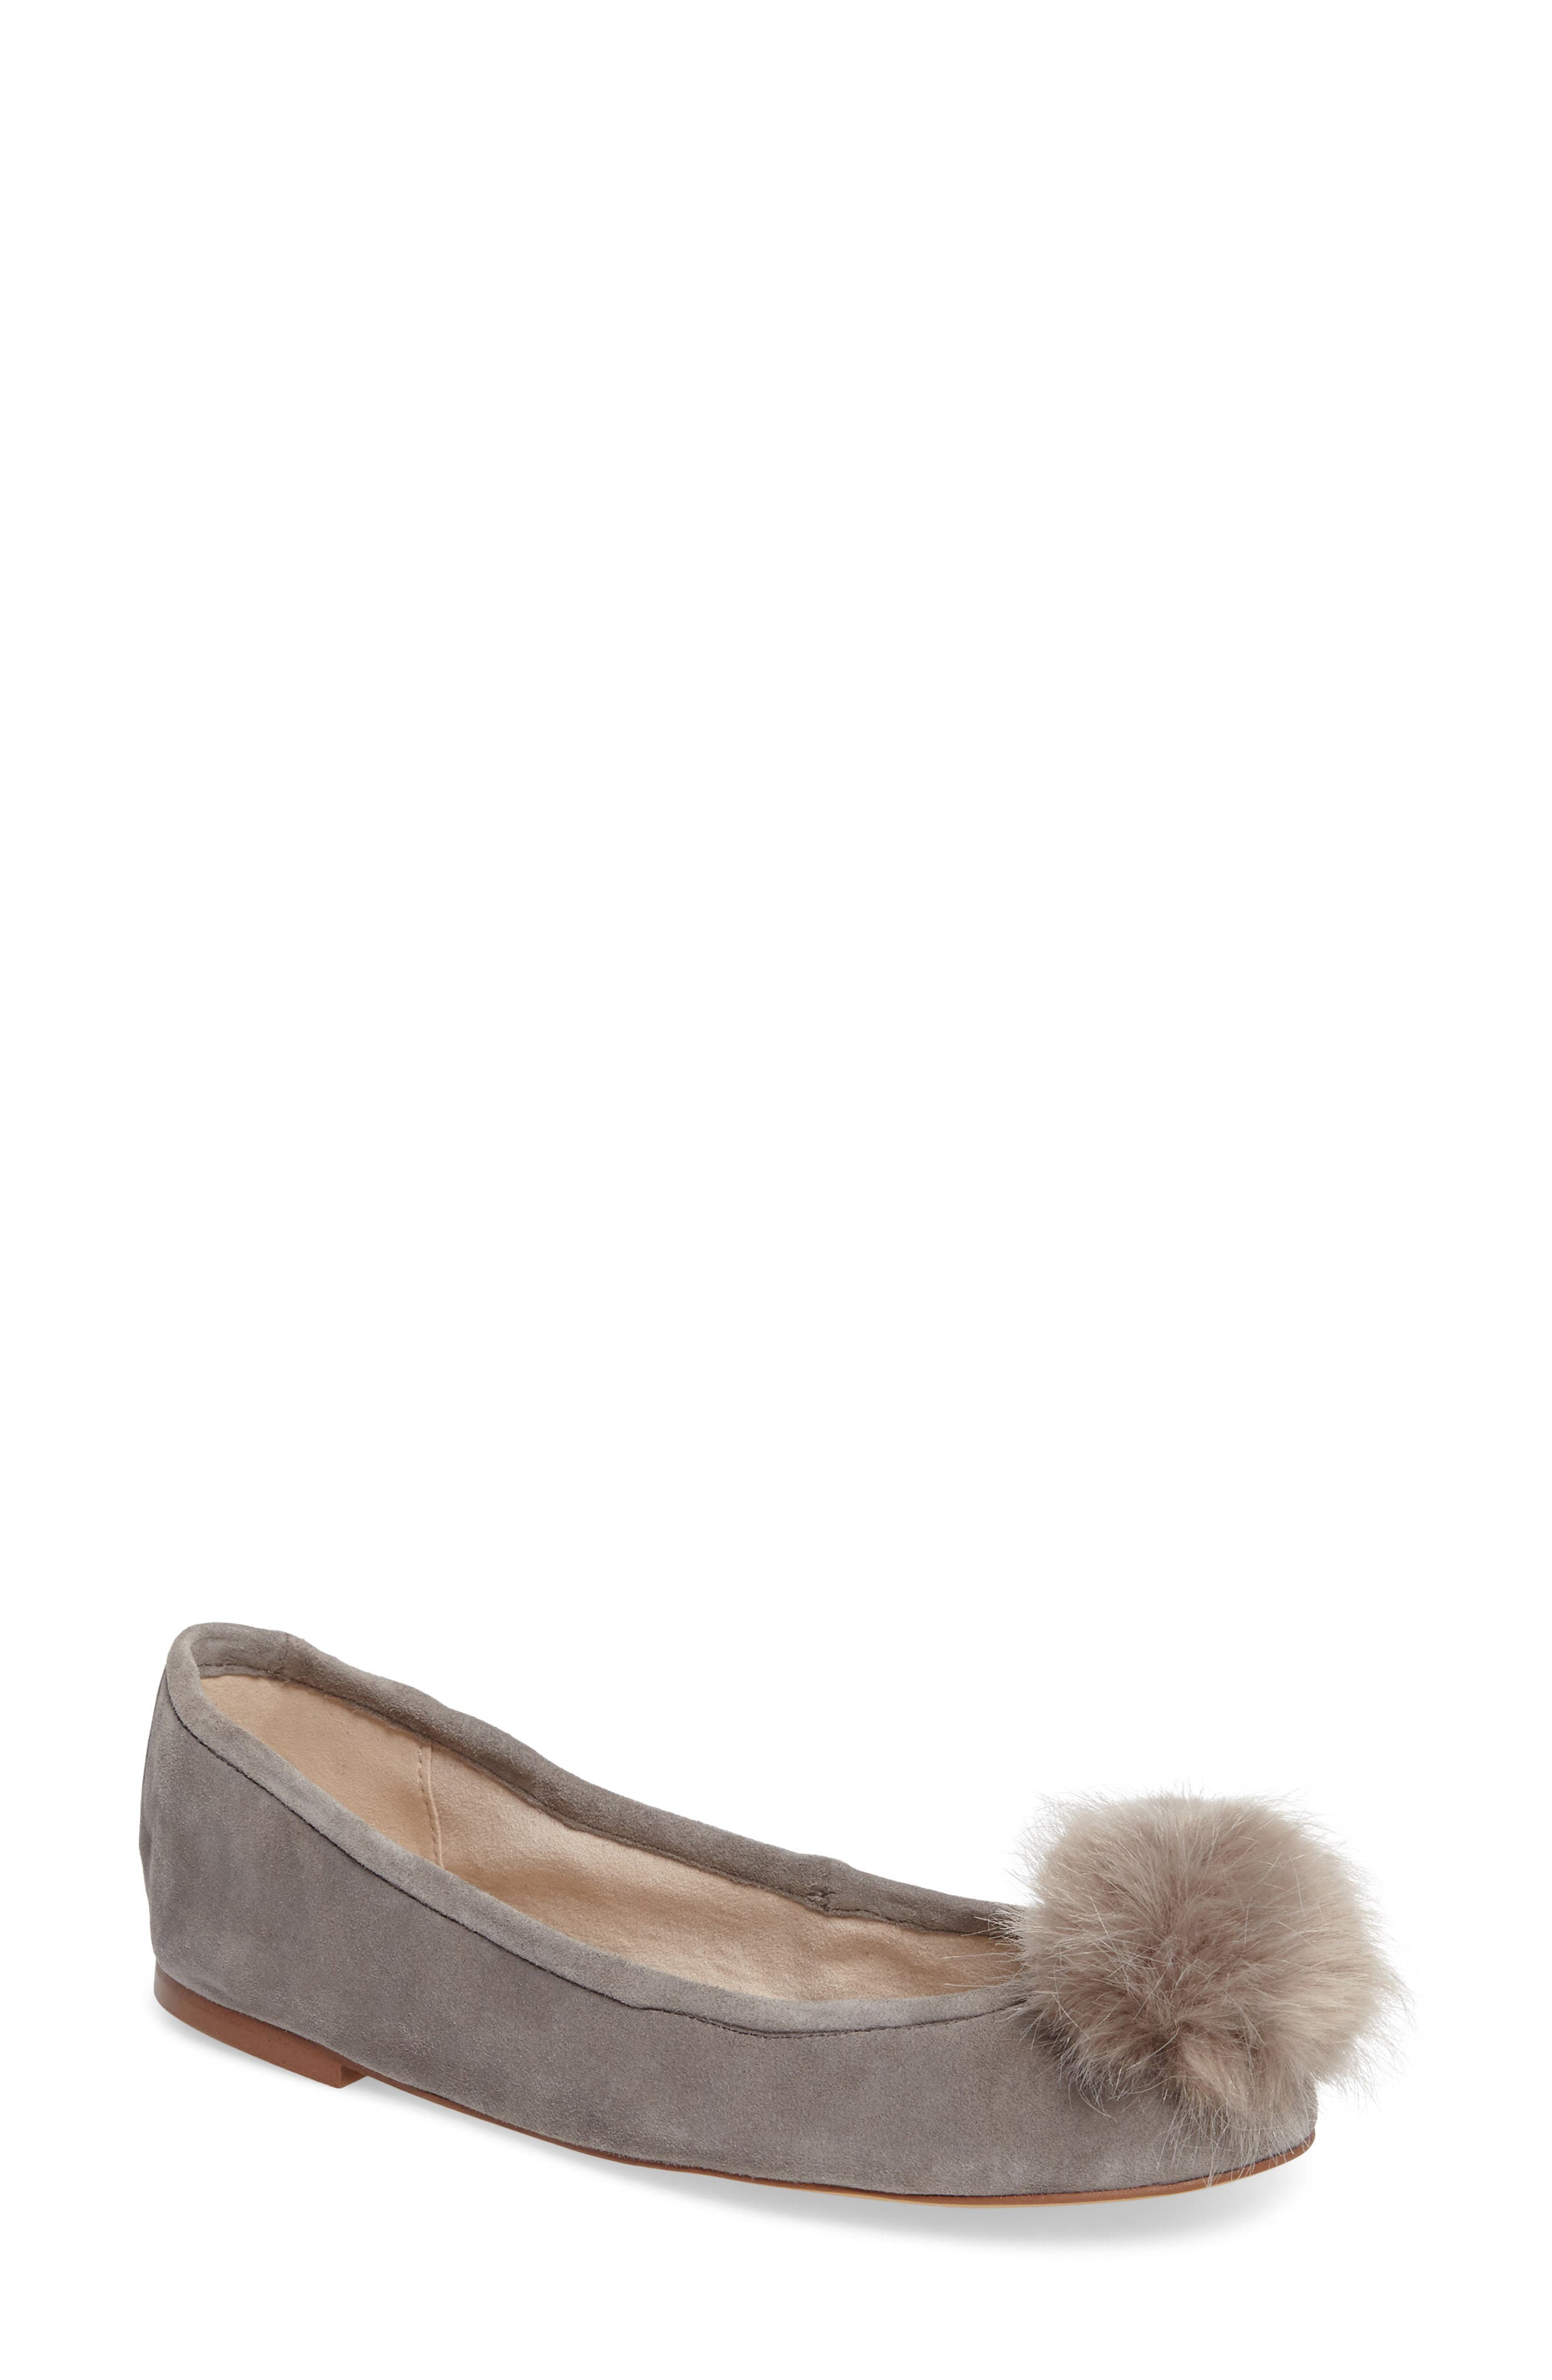 Sam Edelman Farina Flat with Faux Fur Pompom (Women)